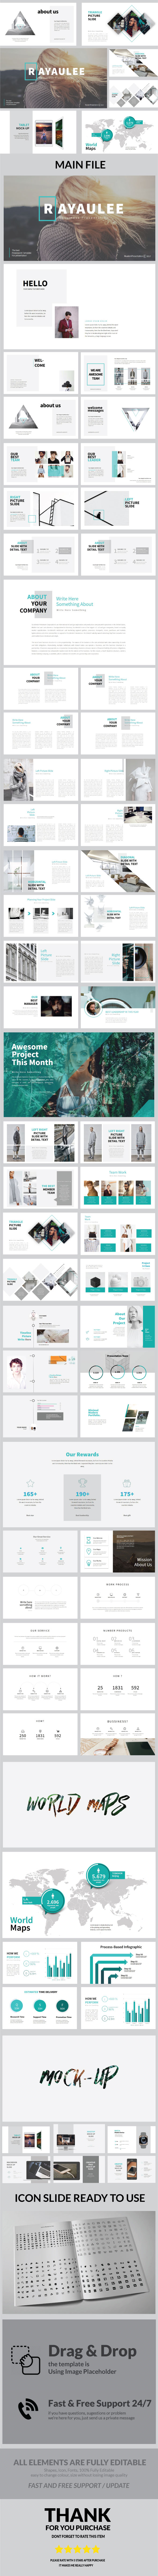 Raya Ulee Multipurpose Powerpoint - Business PowerPoint Templates